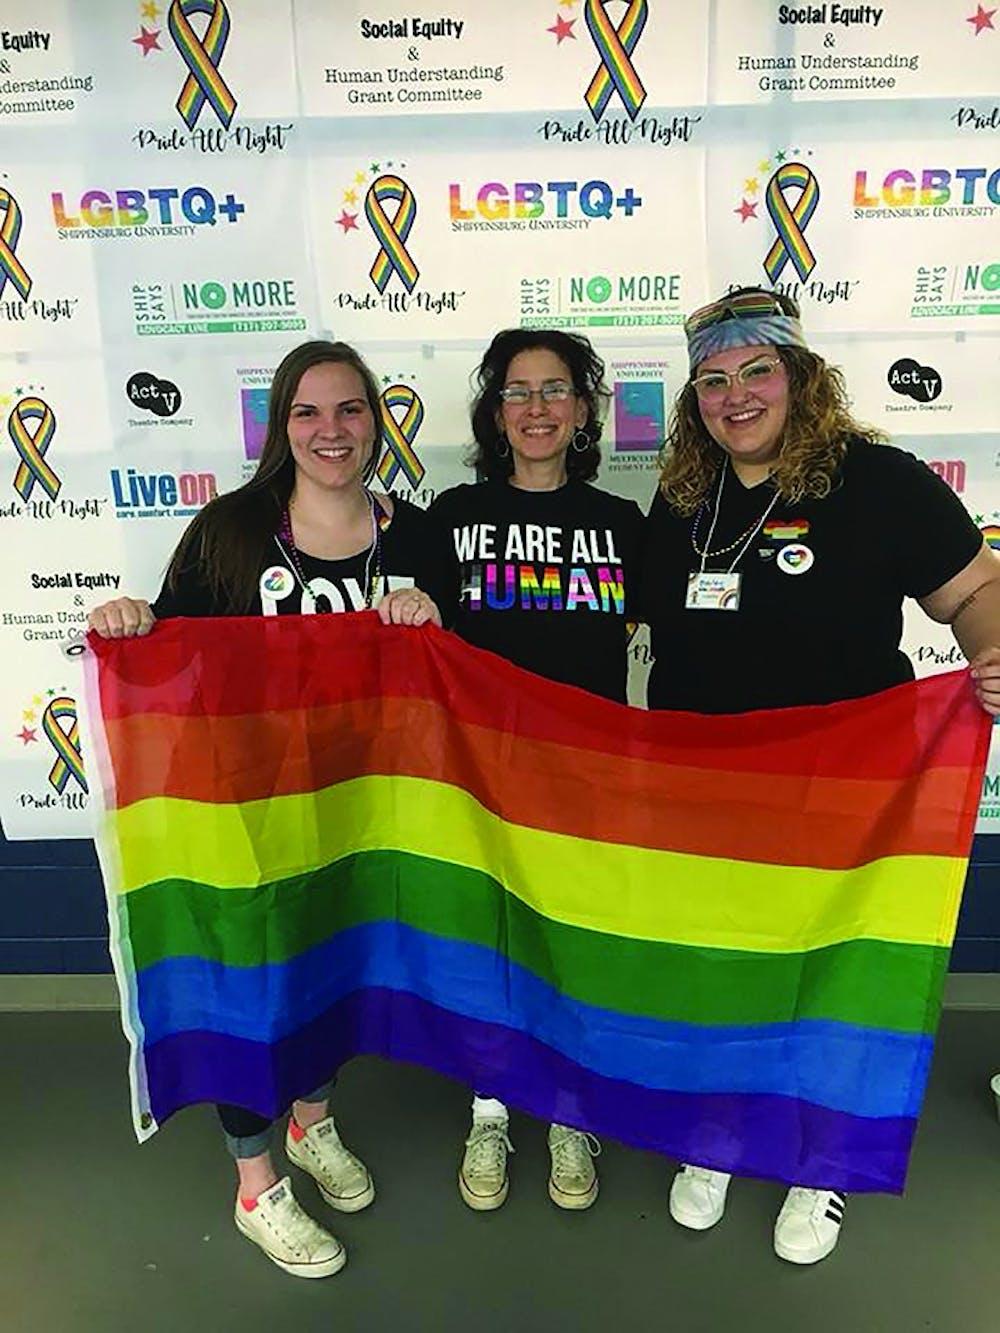 Event celebrates 24 hours of LGBT pride